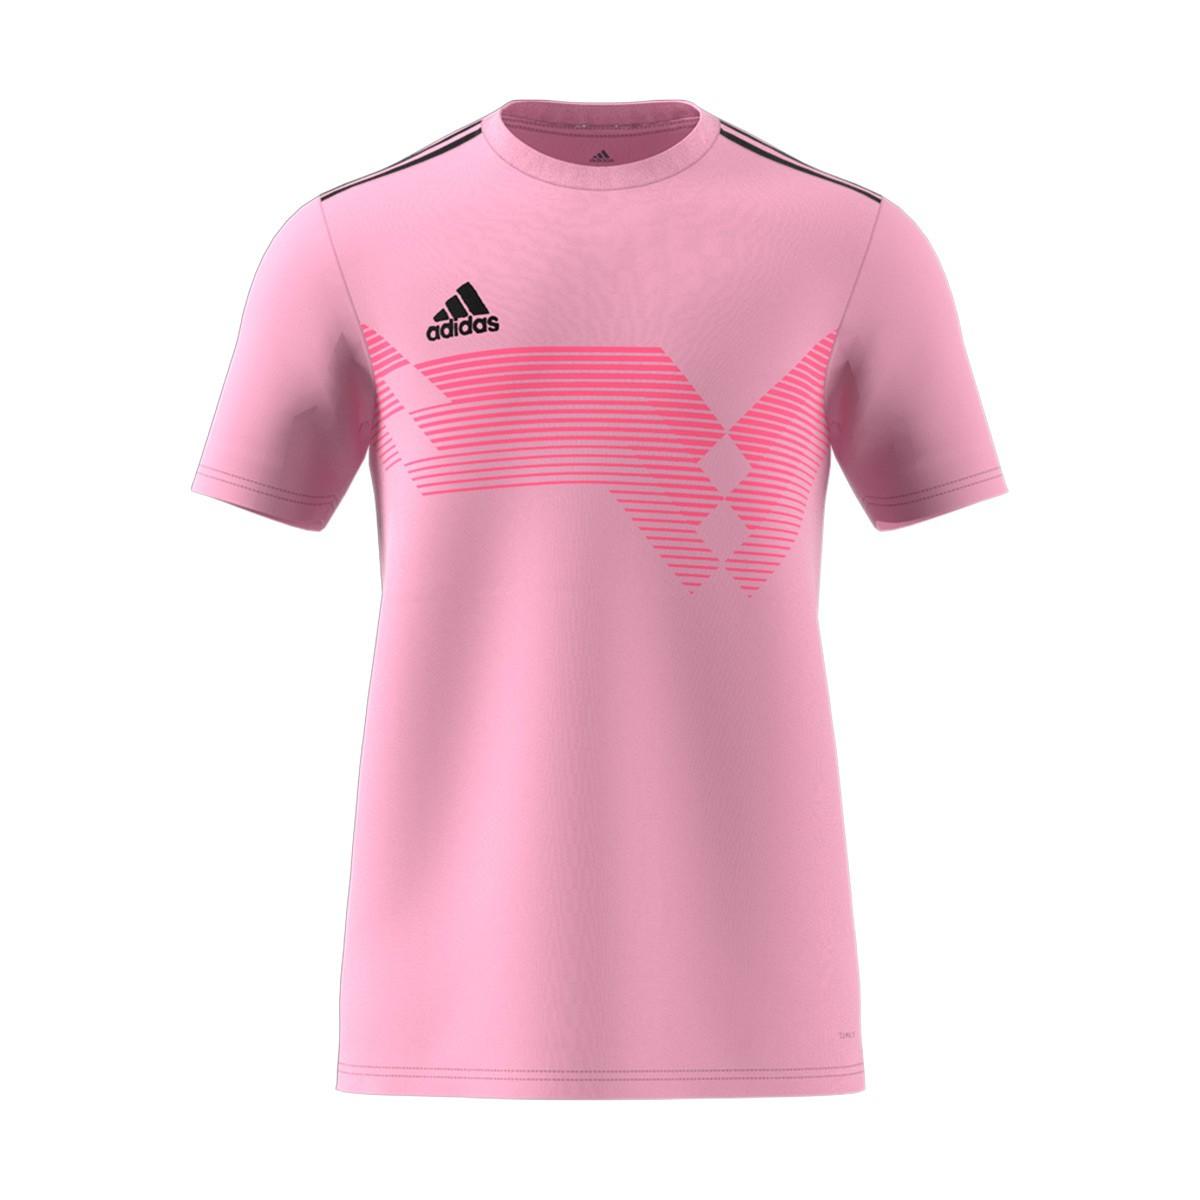 finest selection 7ad80 ae0bb Camiseta Campeon 19 m/c True pink-Black